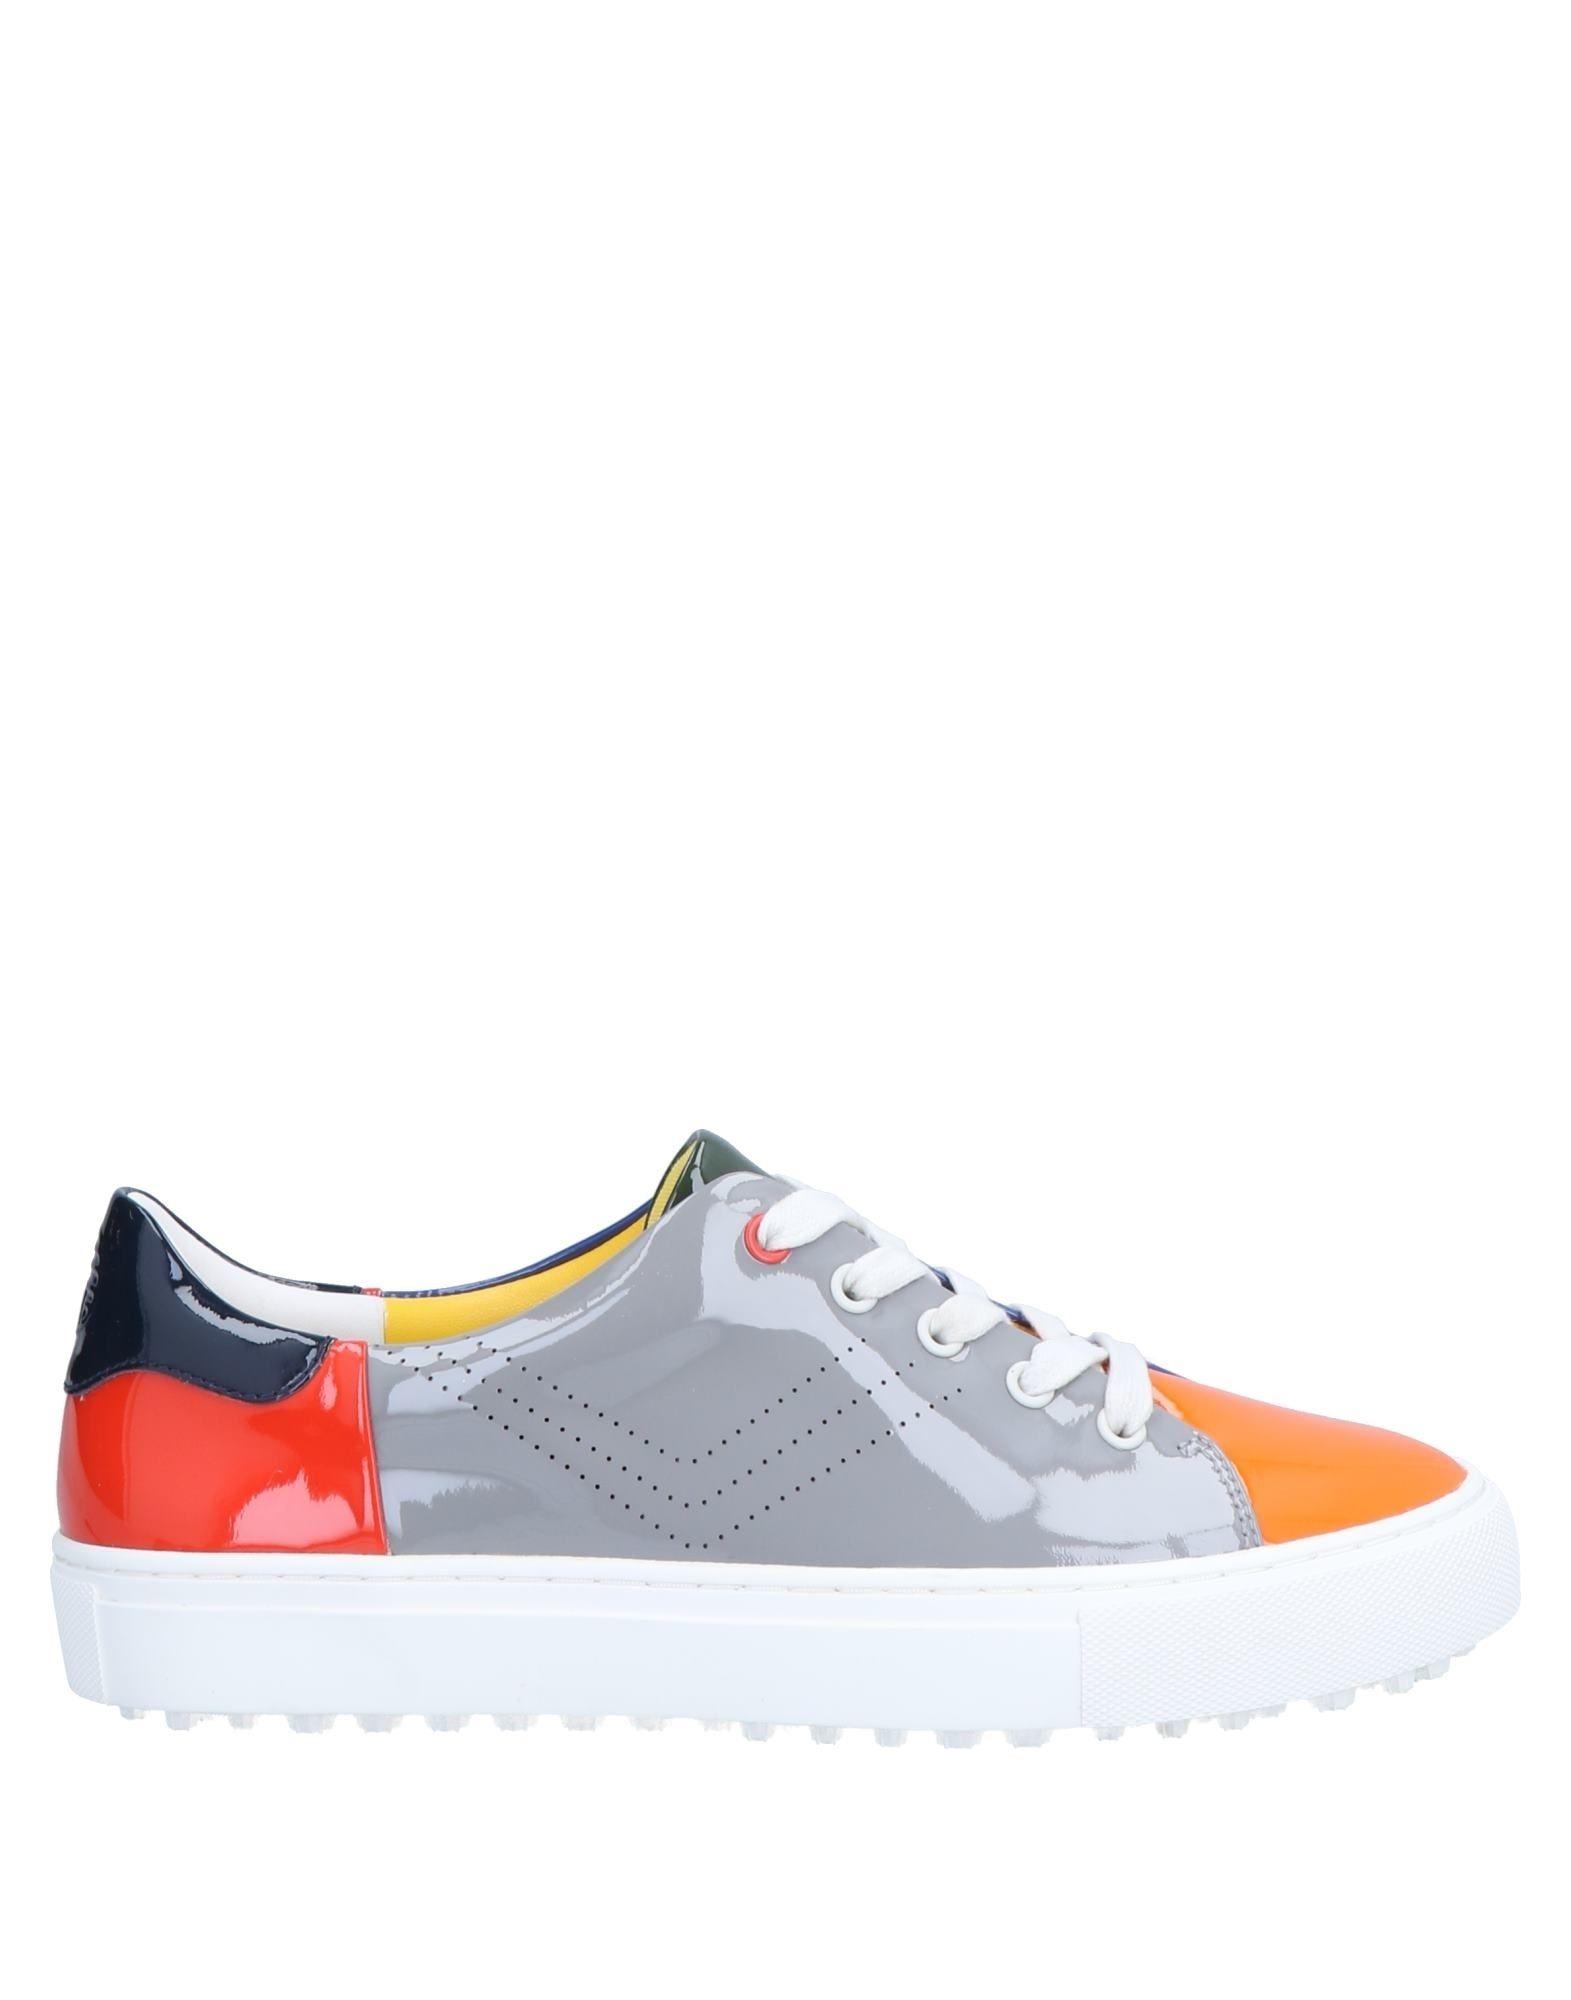 Tory Sport Sneakers Sneakers - Women Tory Sport Sneakers Sneakers online on  Canada - 11575313NB 10b997